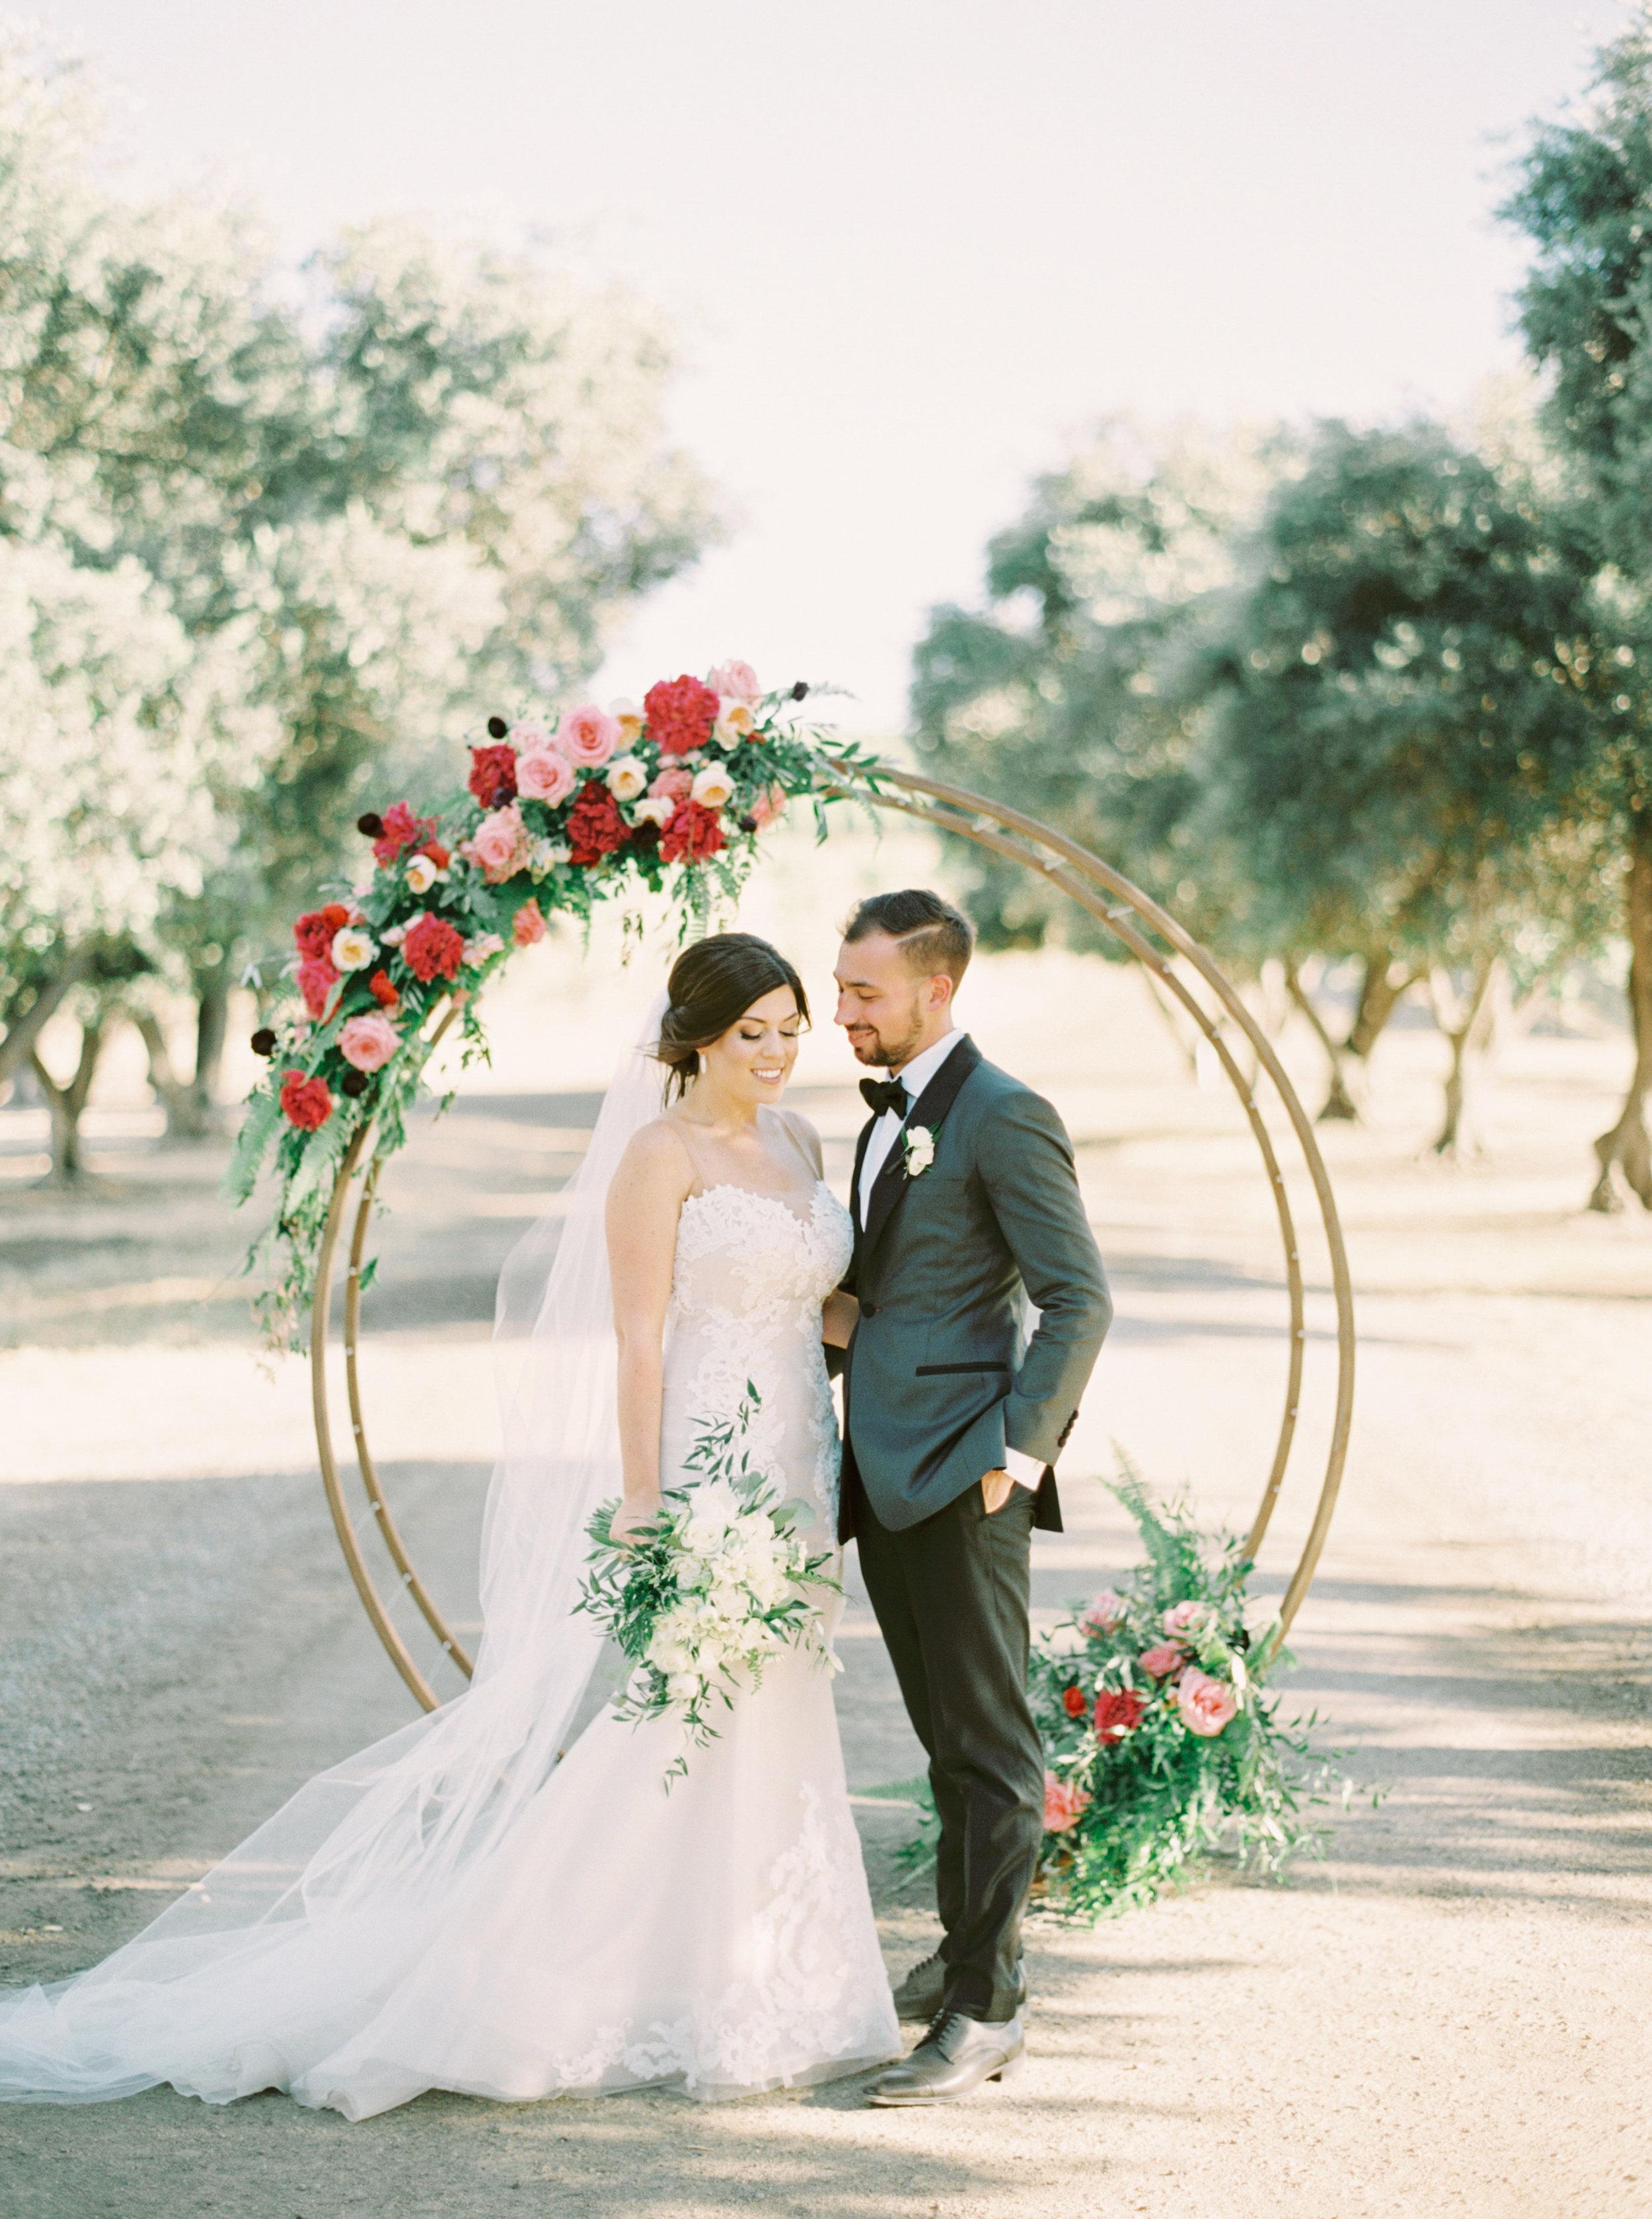 Wente Wedding featured on RuffledBlog - https://ruffledblog.com/modern-vineyard-wedding-whimsical-burgundy/